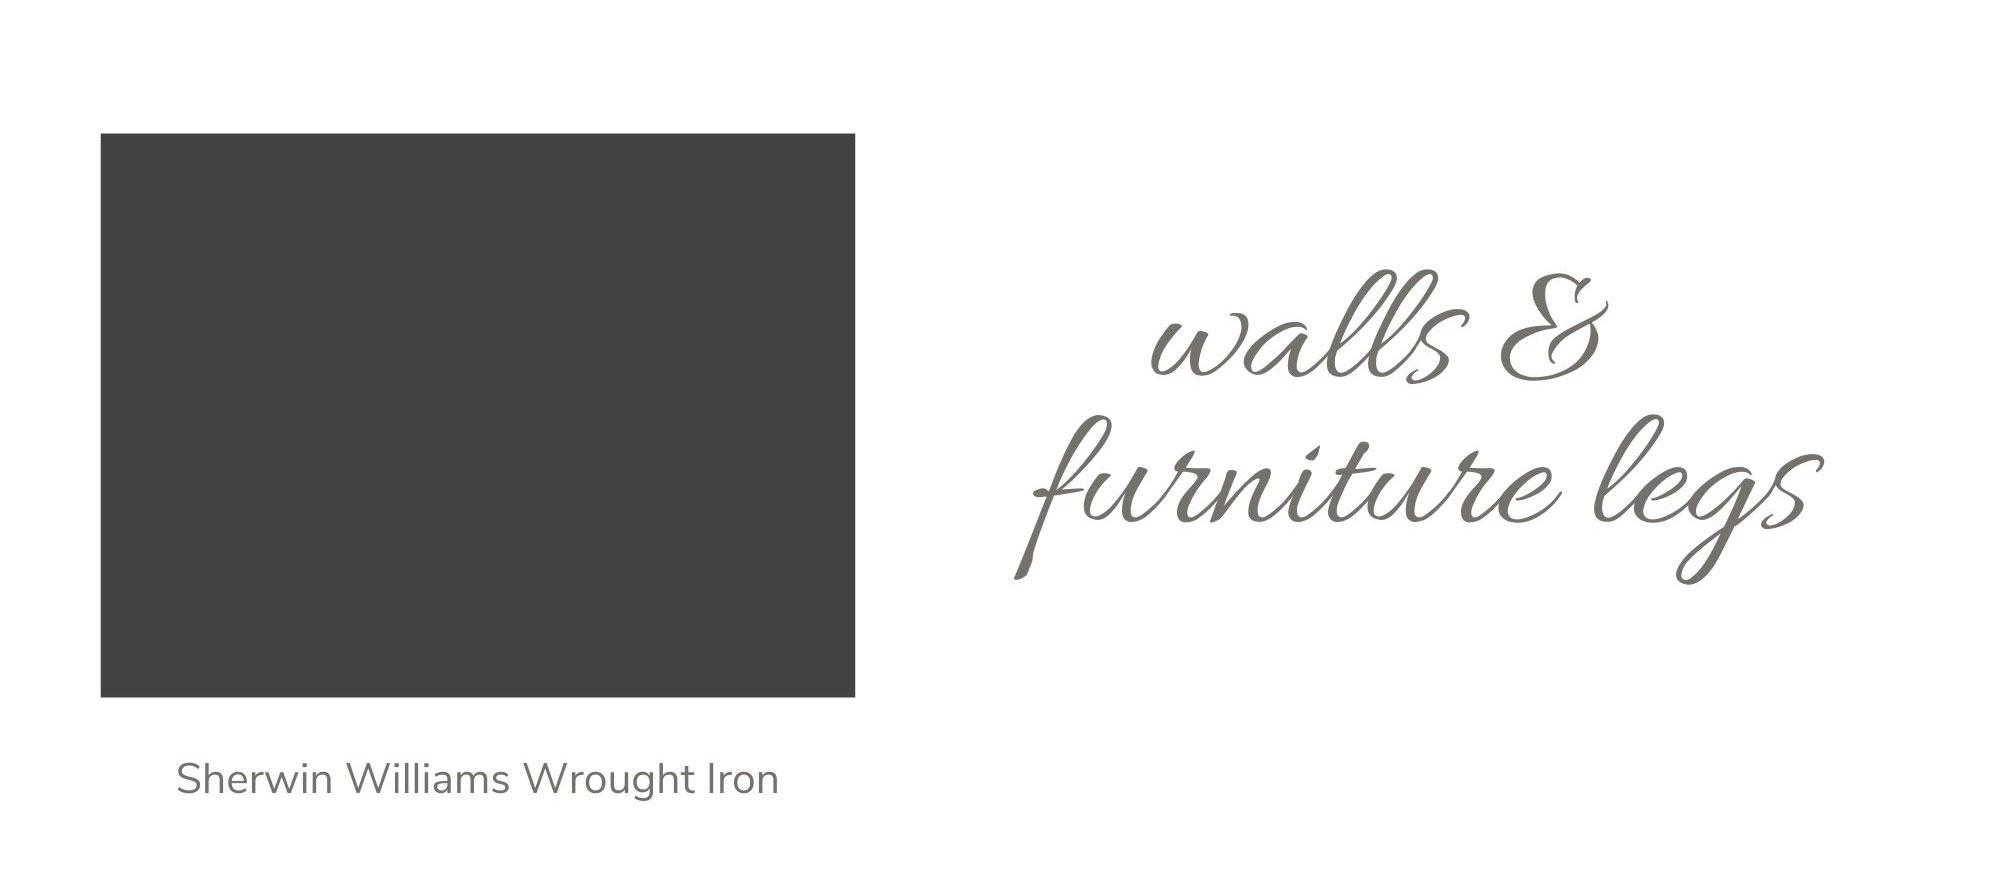 Sherwin Williams Wrought Iron Paint